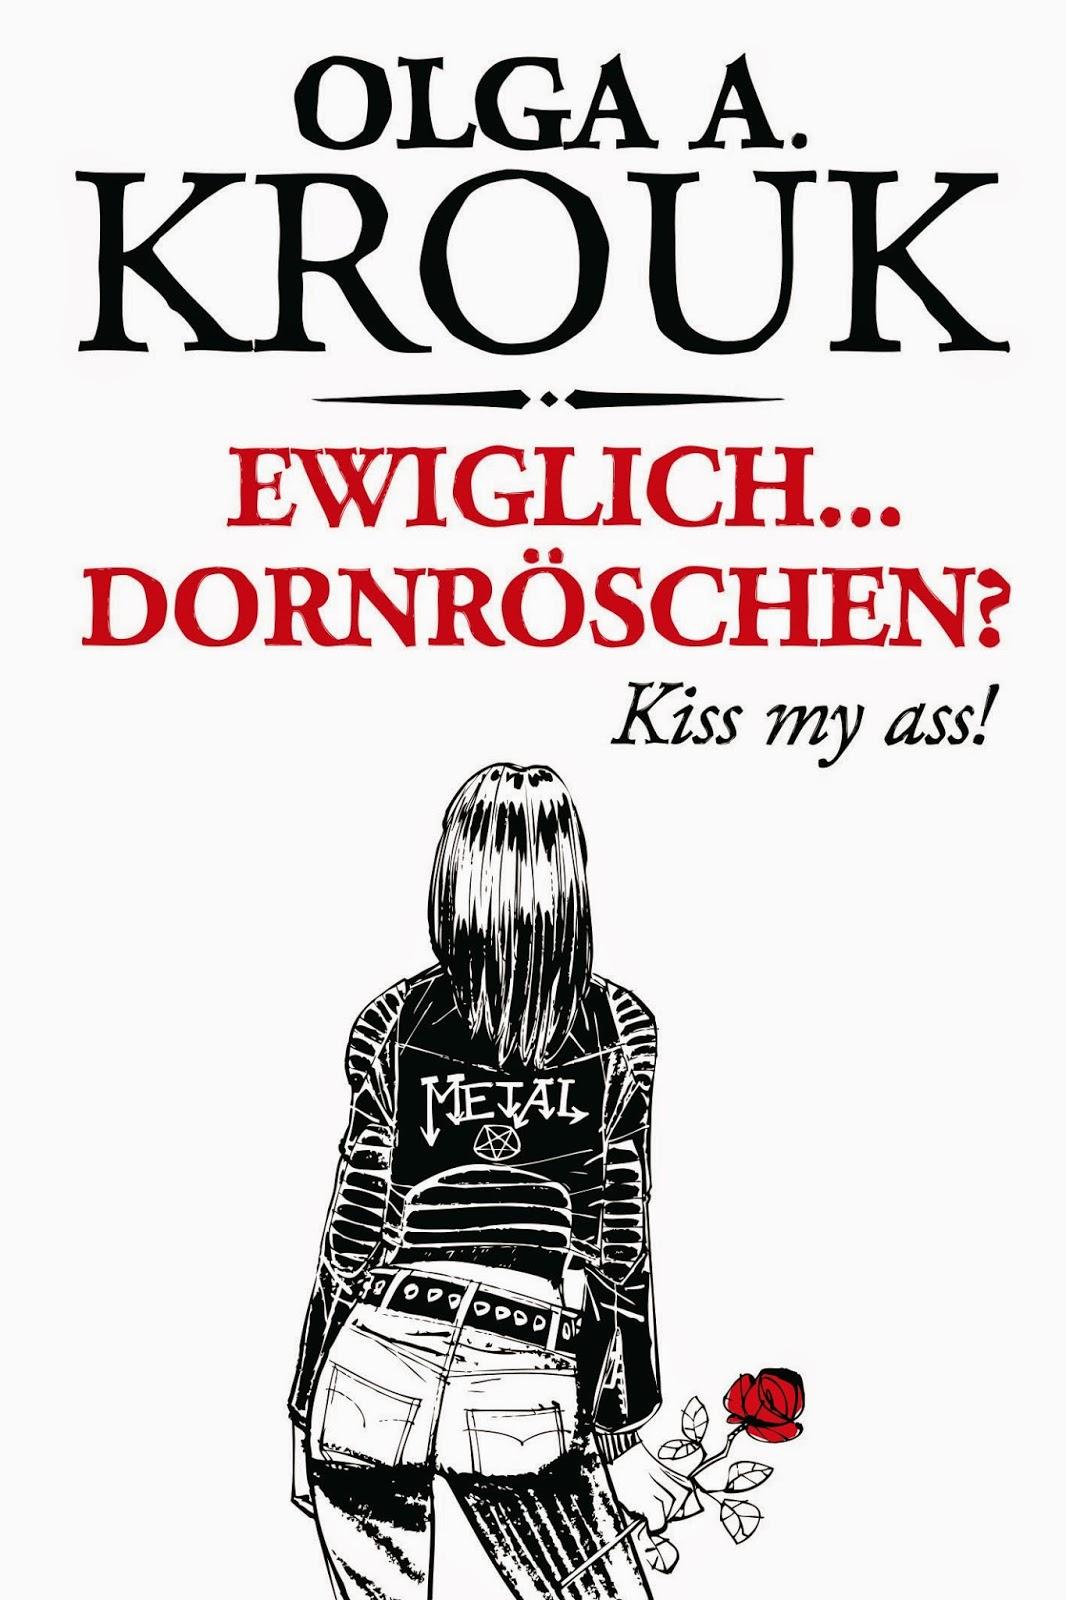 http://www.amazon.de/Ewiglich-Dornr%C3%B6schen-Kiss-my-ass/dp/3944154304/ref=sr_1_1_twi_2?ie=UTF8&qid=1417882813&sr=8-1&keywords=Ewiglich+...+Dornr%C3%B6schen%3F%3A+Kiss+my+ass!